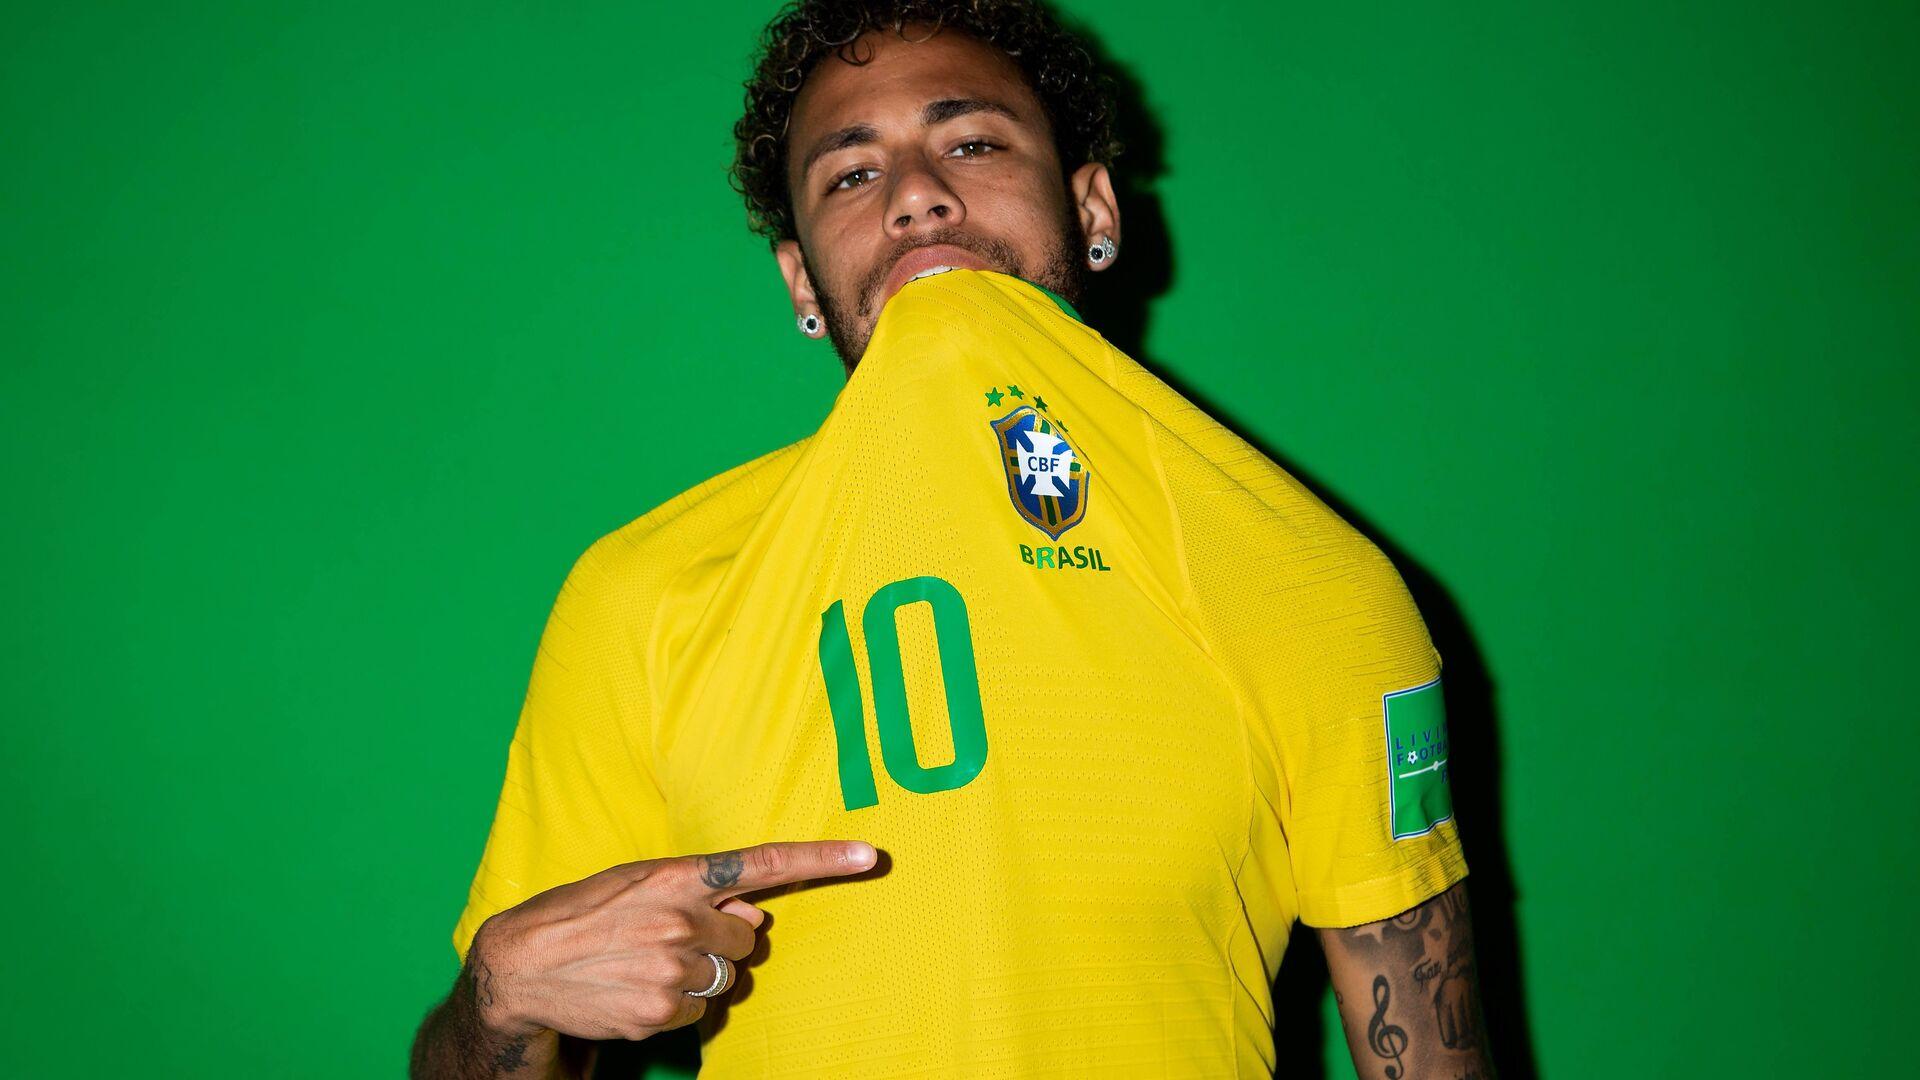 1920x1080 Neymar Jr Brazil Portraits 2018 Laptop Full HD ...